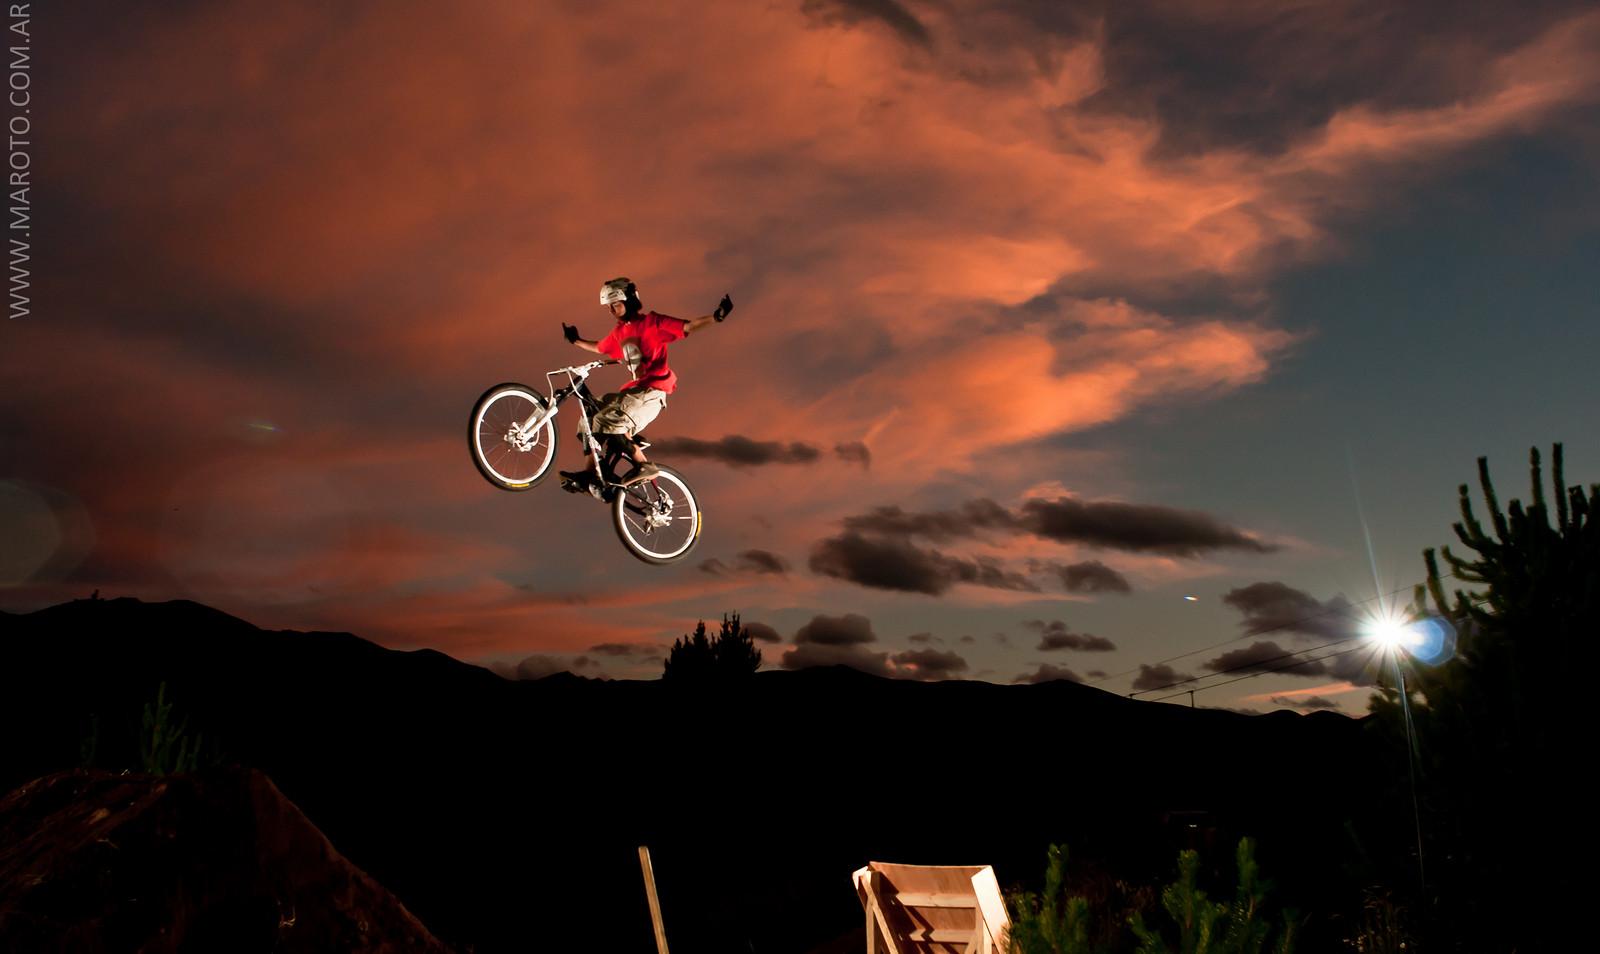 F*** you world - juanmaboos - Mountain Biking Pictures - Vital MTB